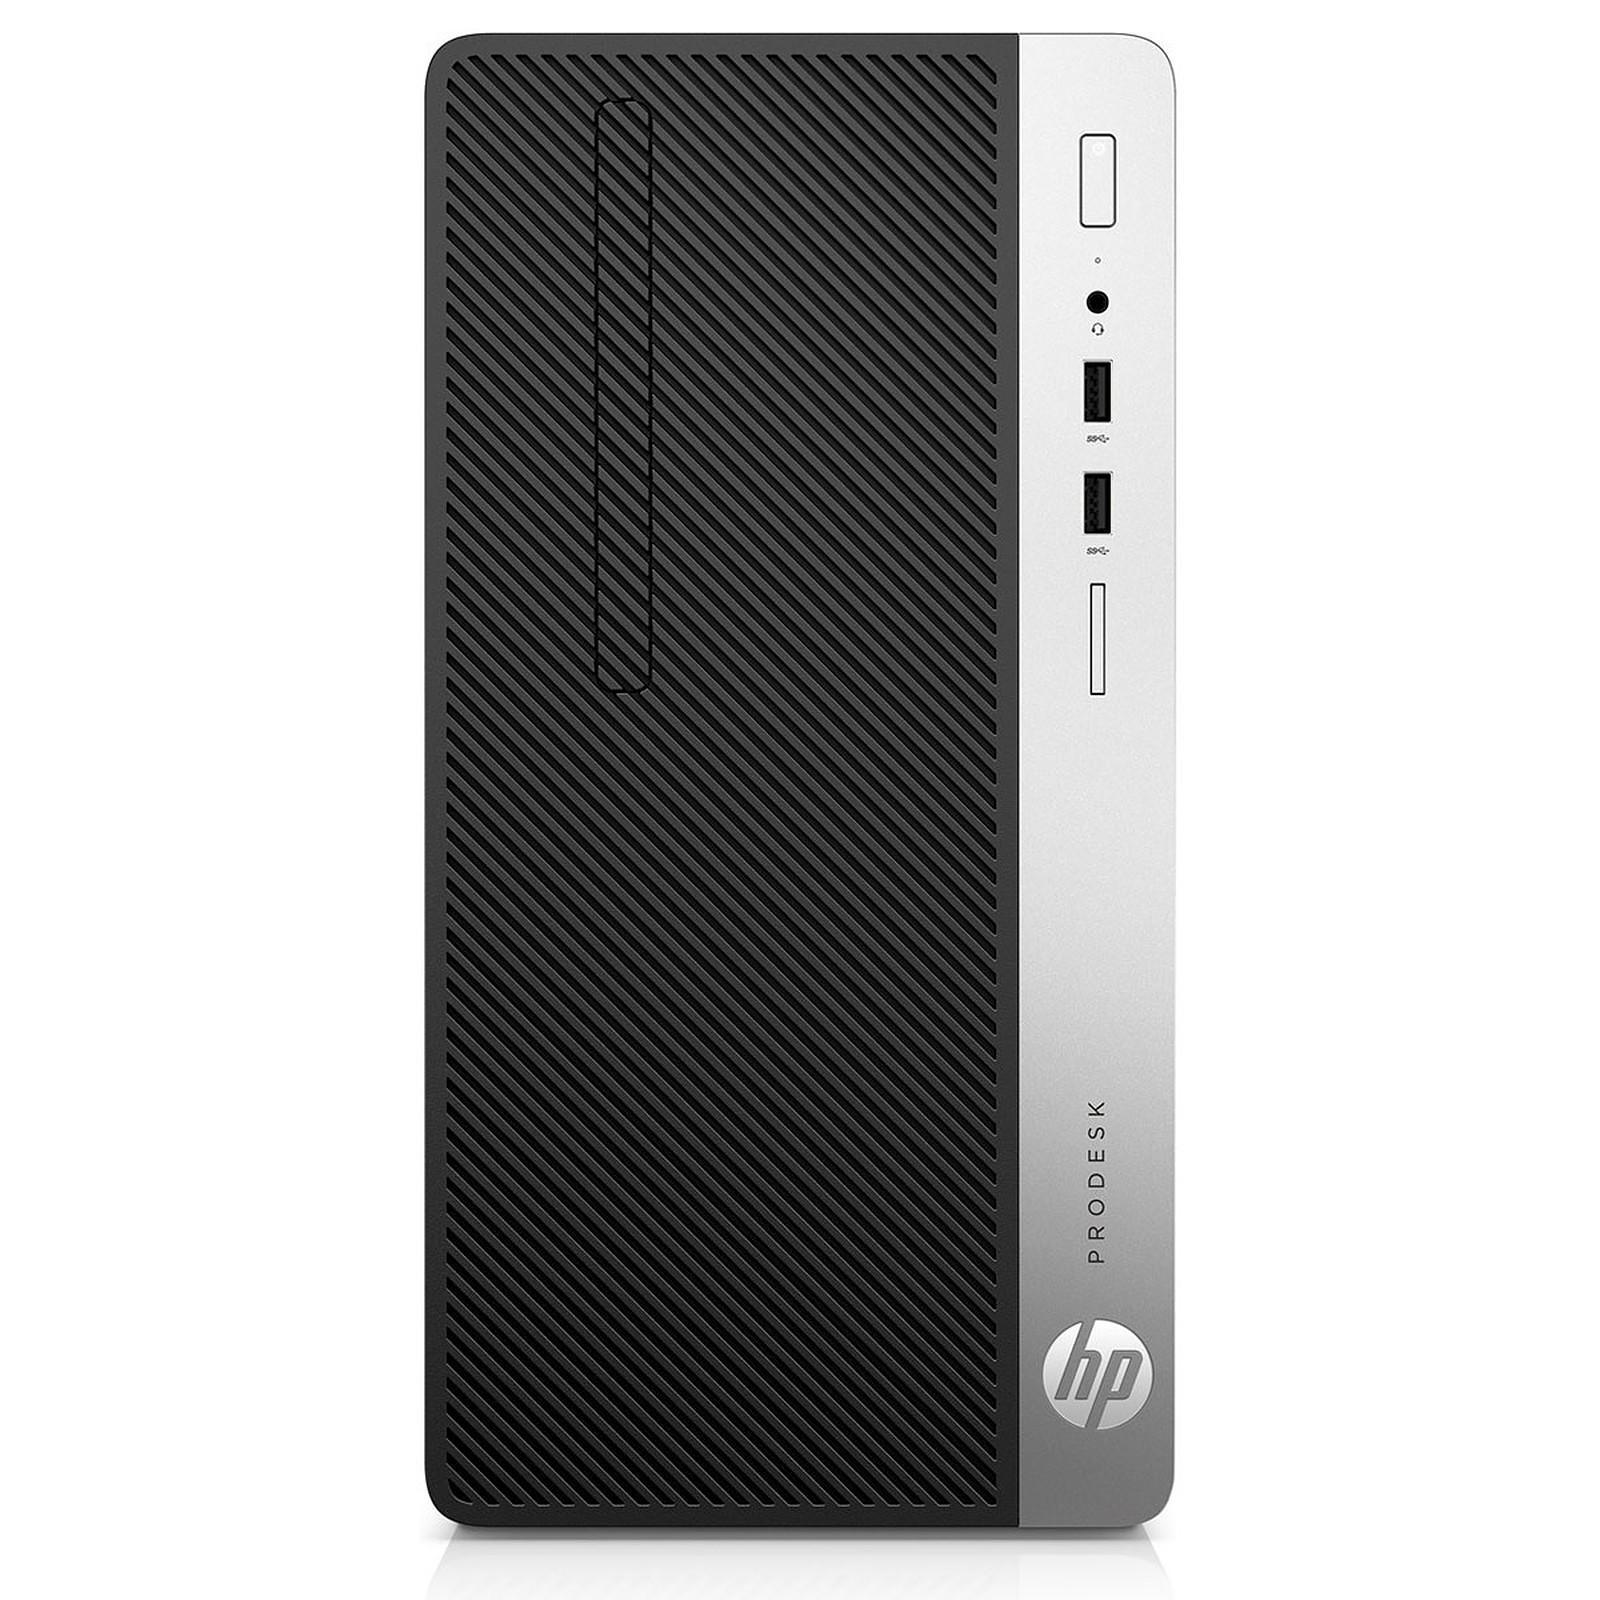 e659f22e699820 HP ProDesk 400 G4 Compact (1QM22EA) - PC de bureau HP sur LDLC.com